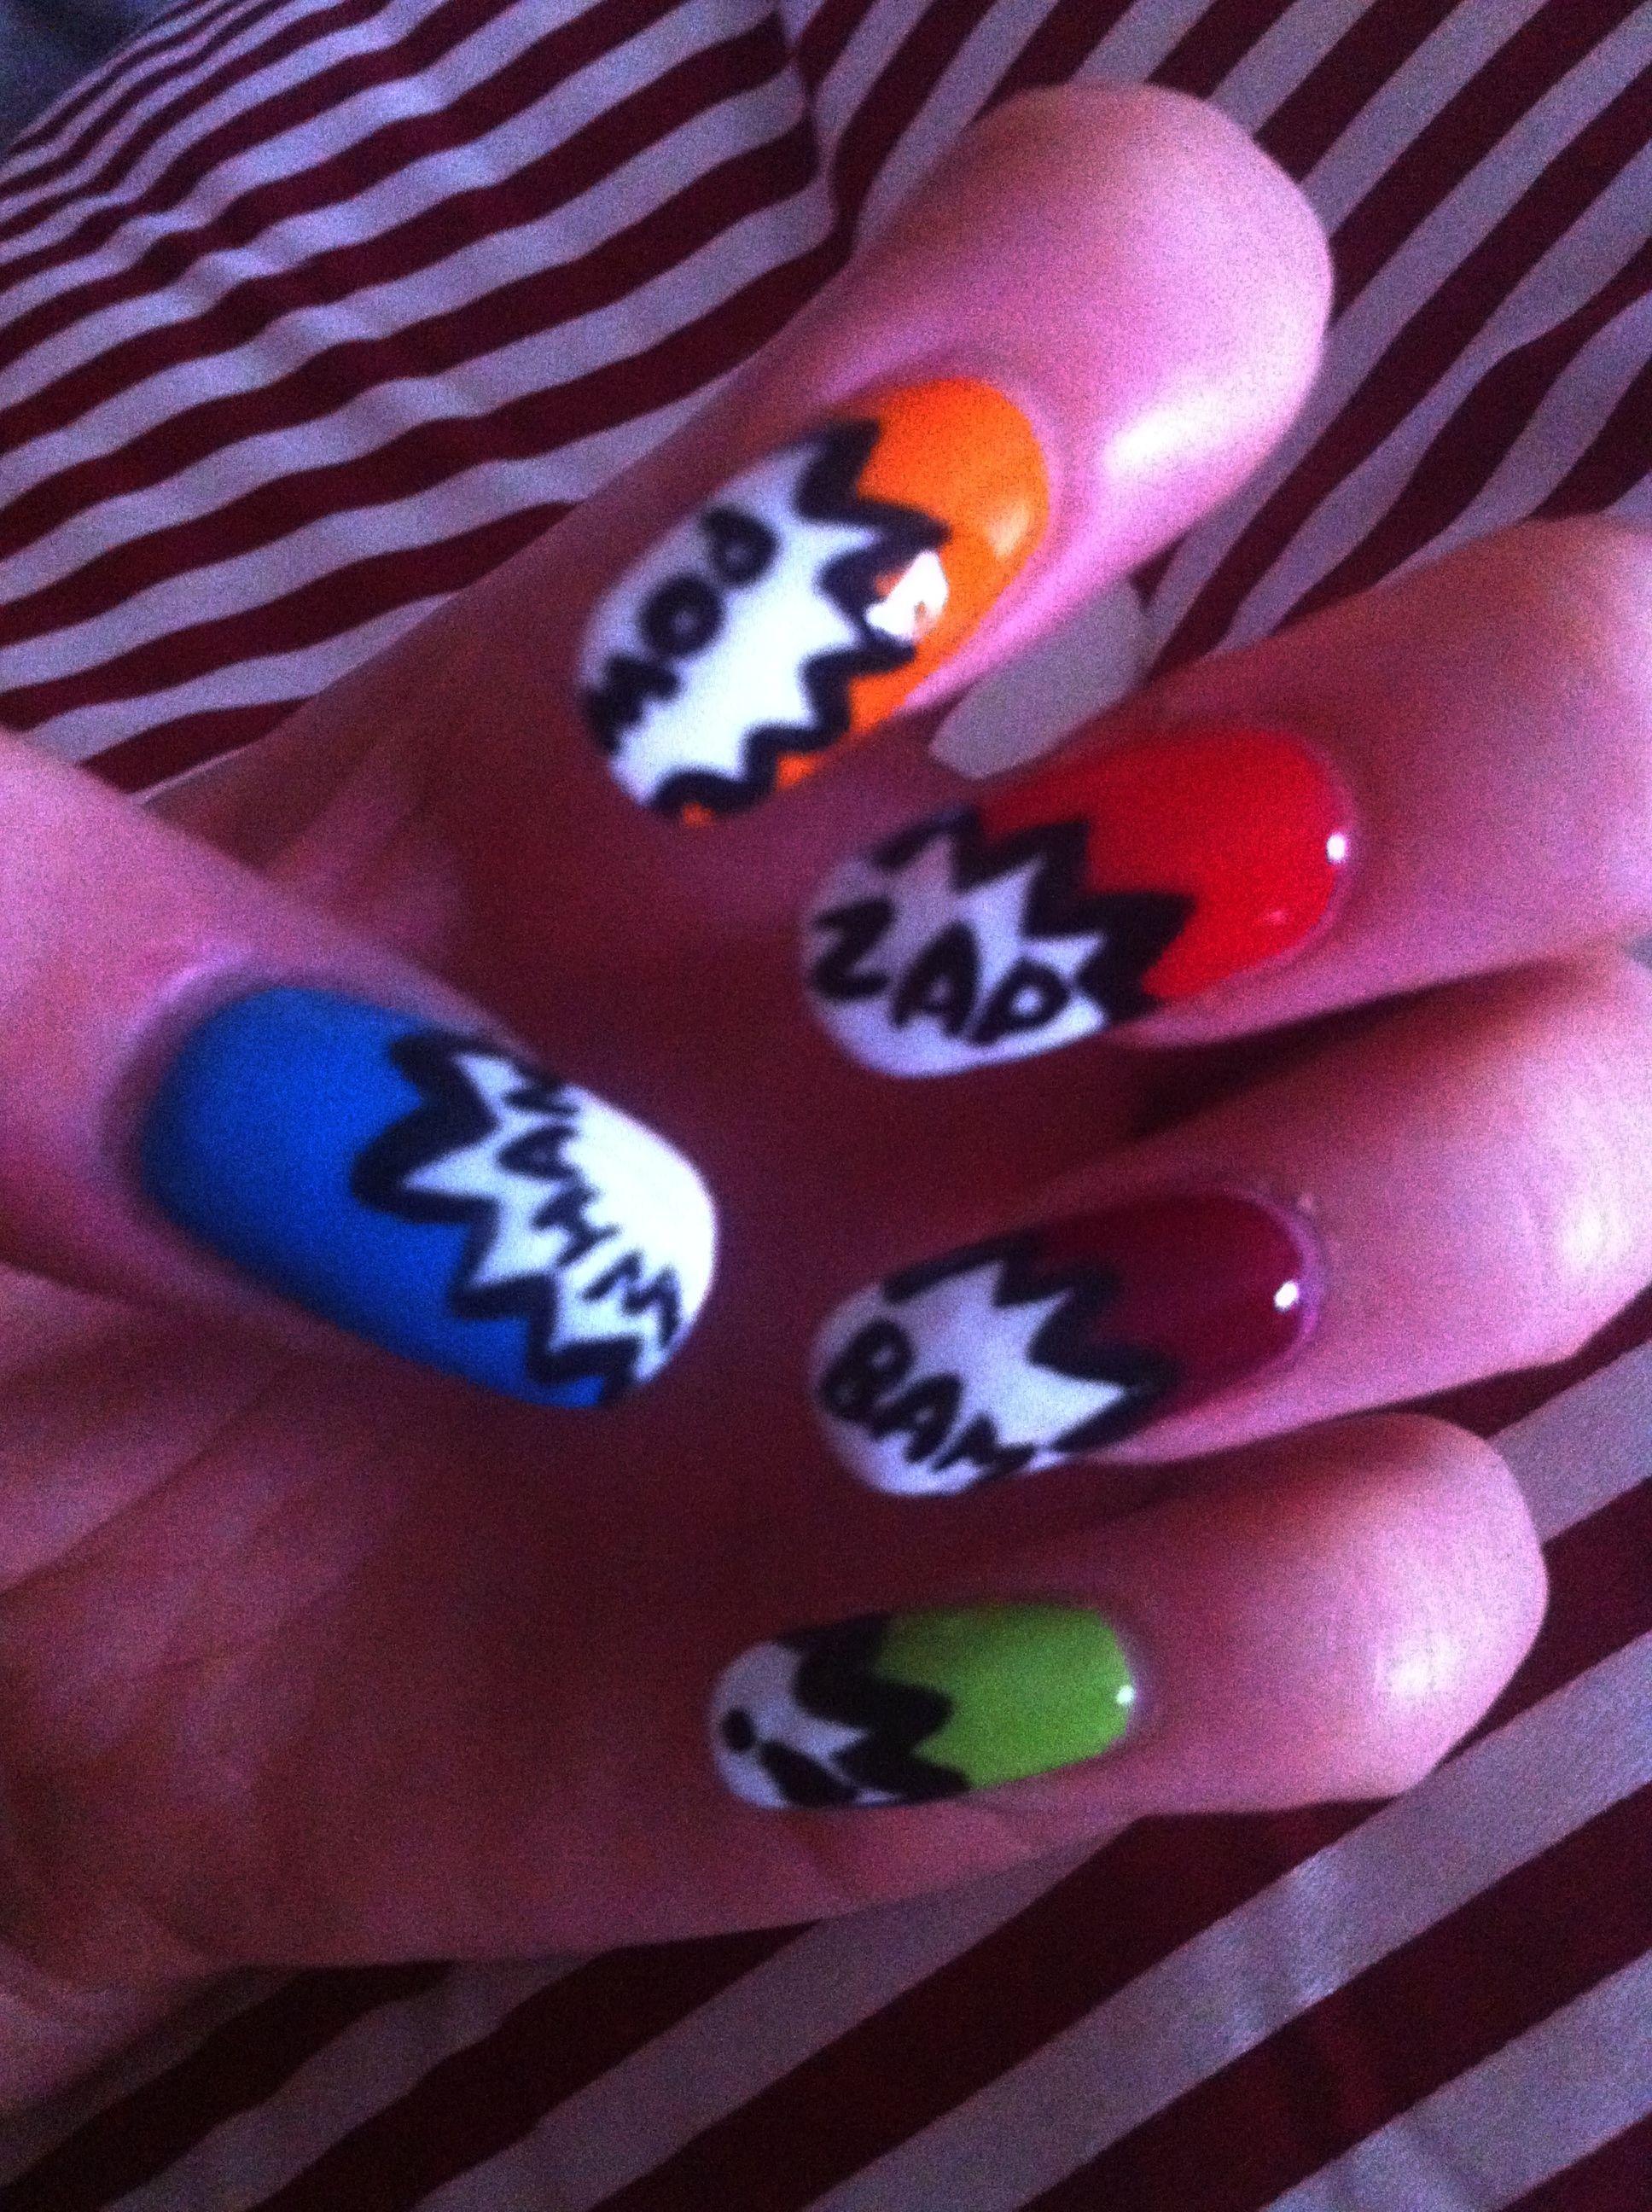 my funky nail art | Nails | Pinterest | Funky nail art, Pedicure ...